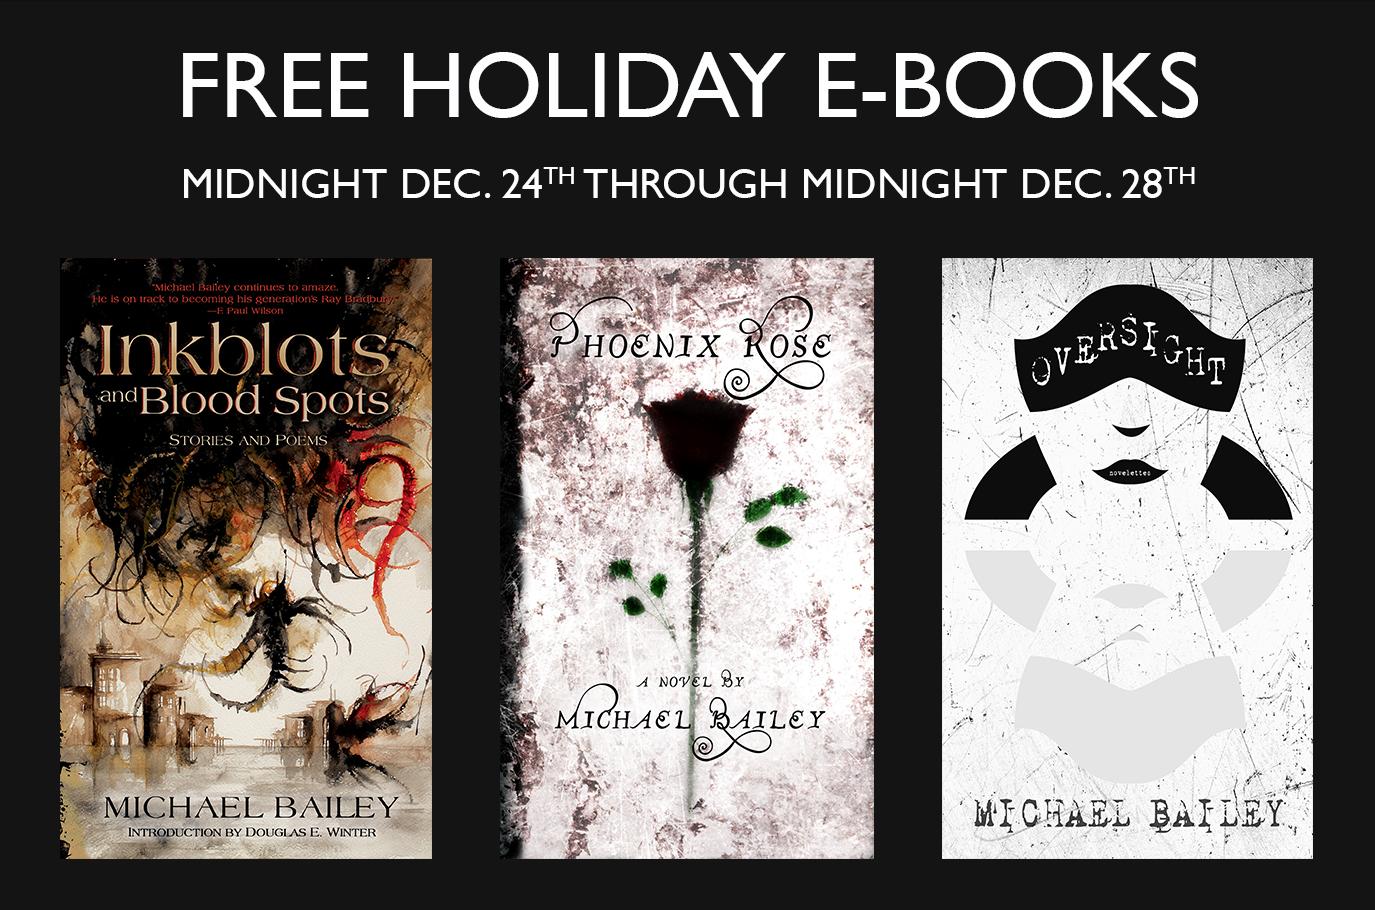 Free e-Book Holiday